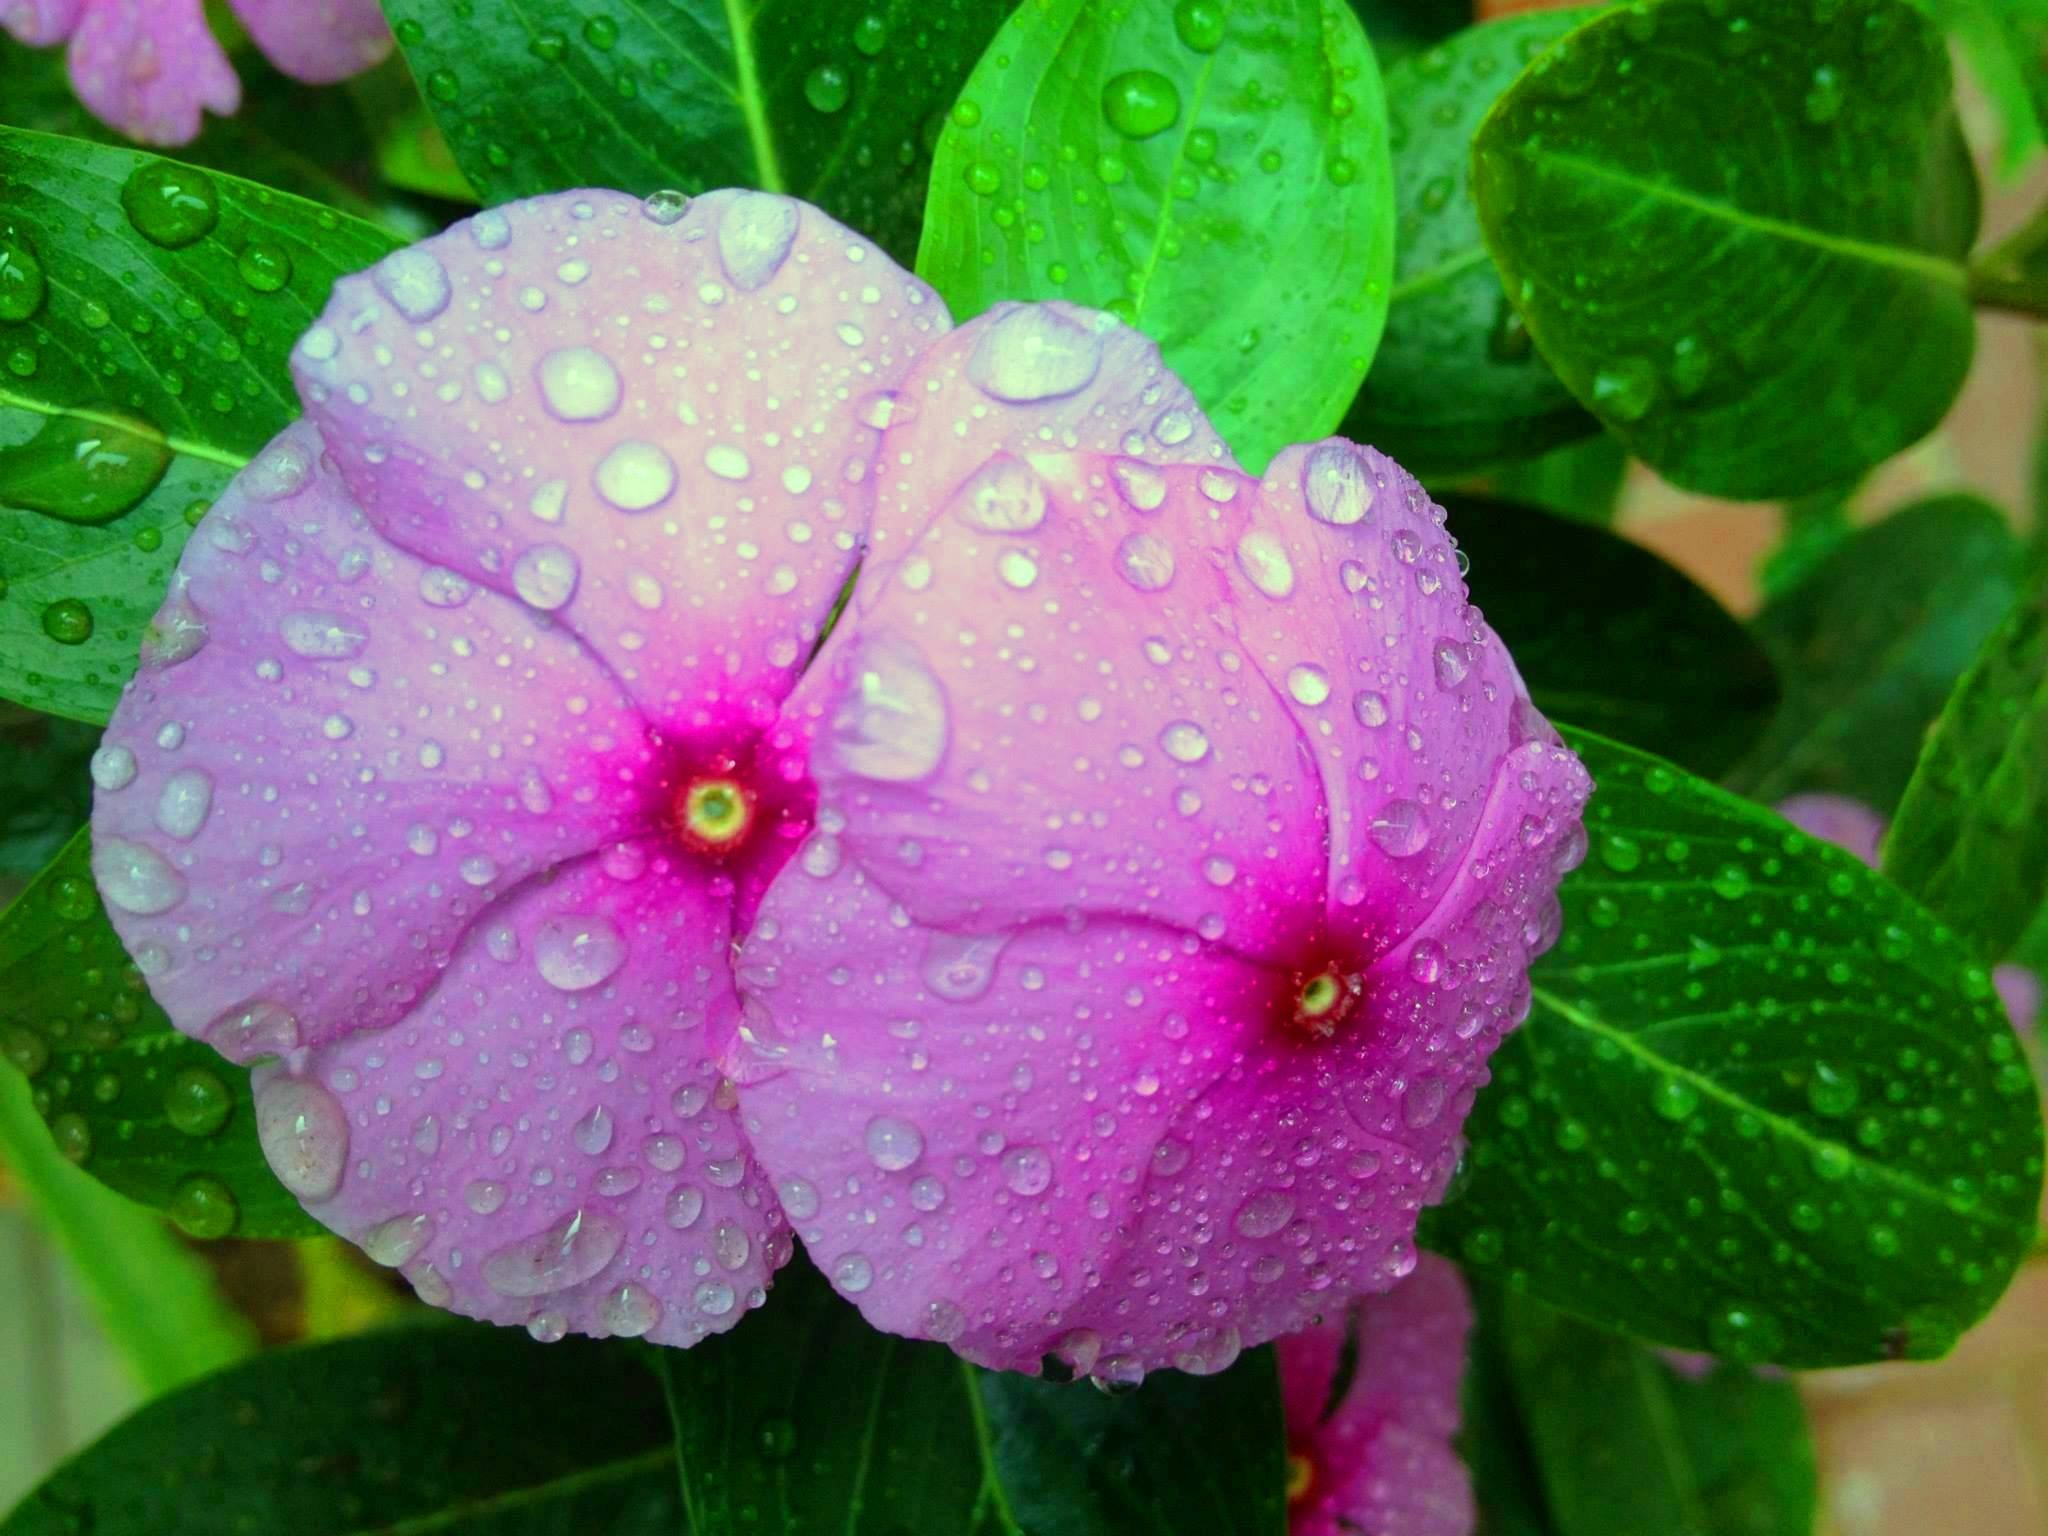 Rain Drop At Flowers by Bharat75